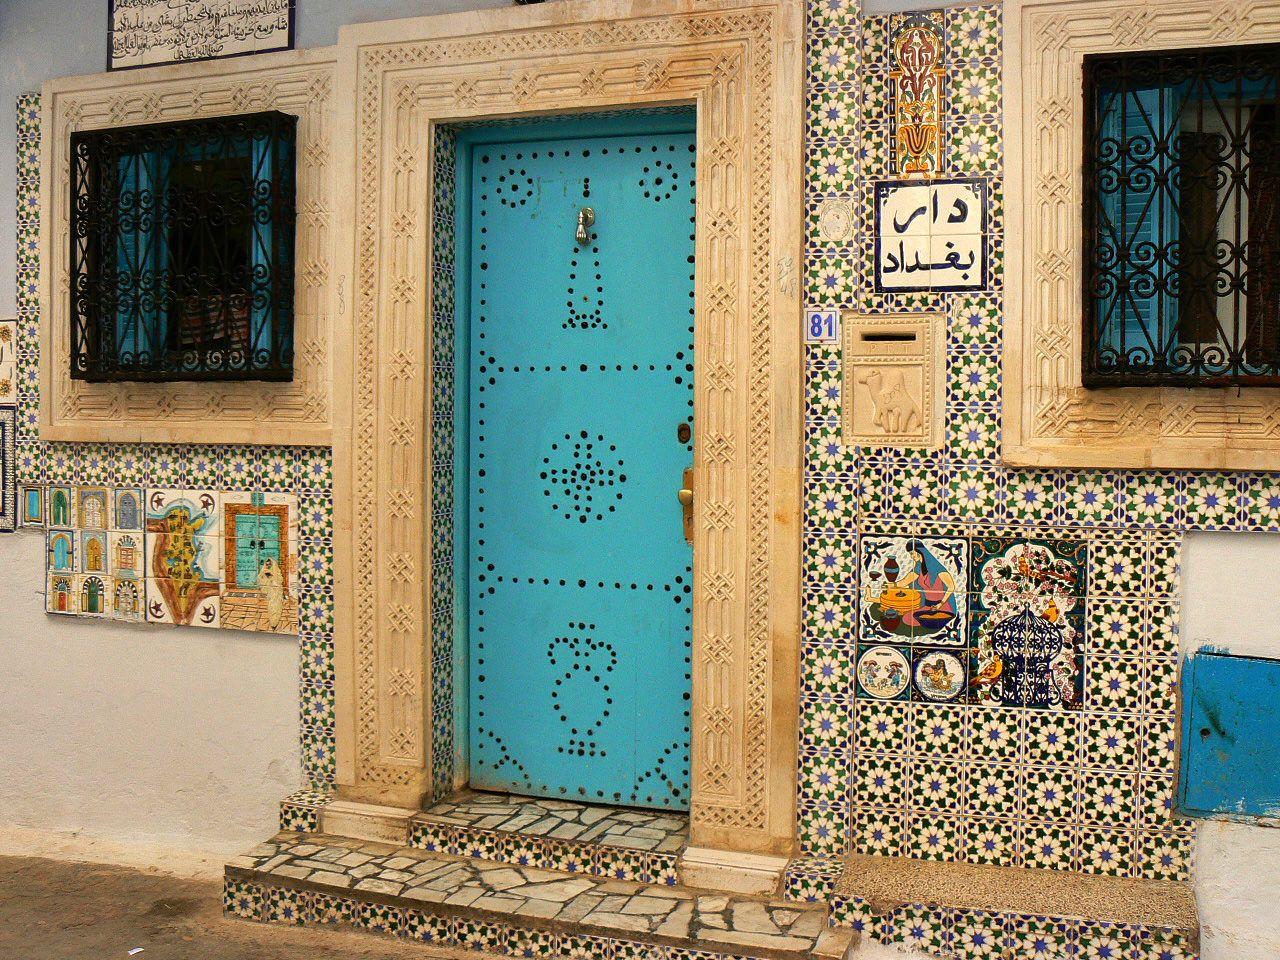 door somewhere in tunisia